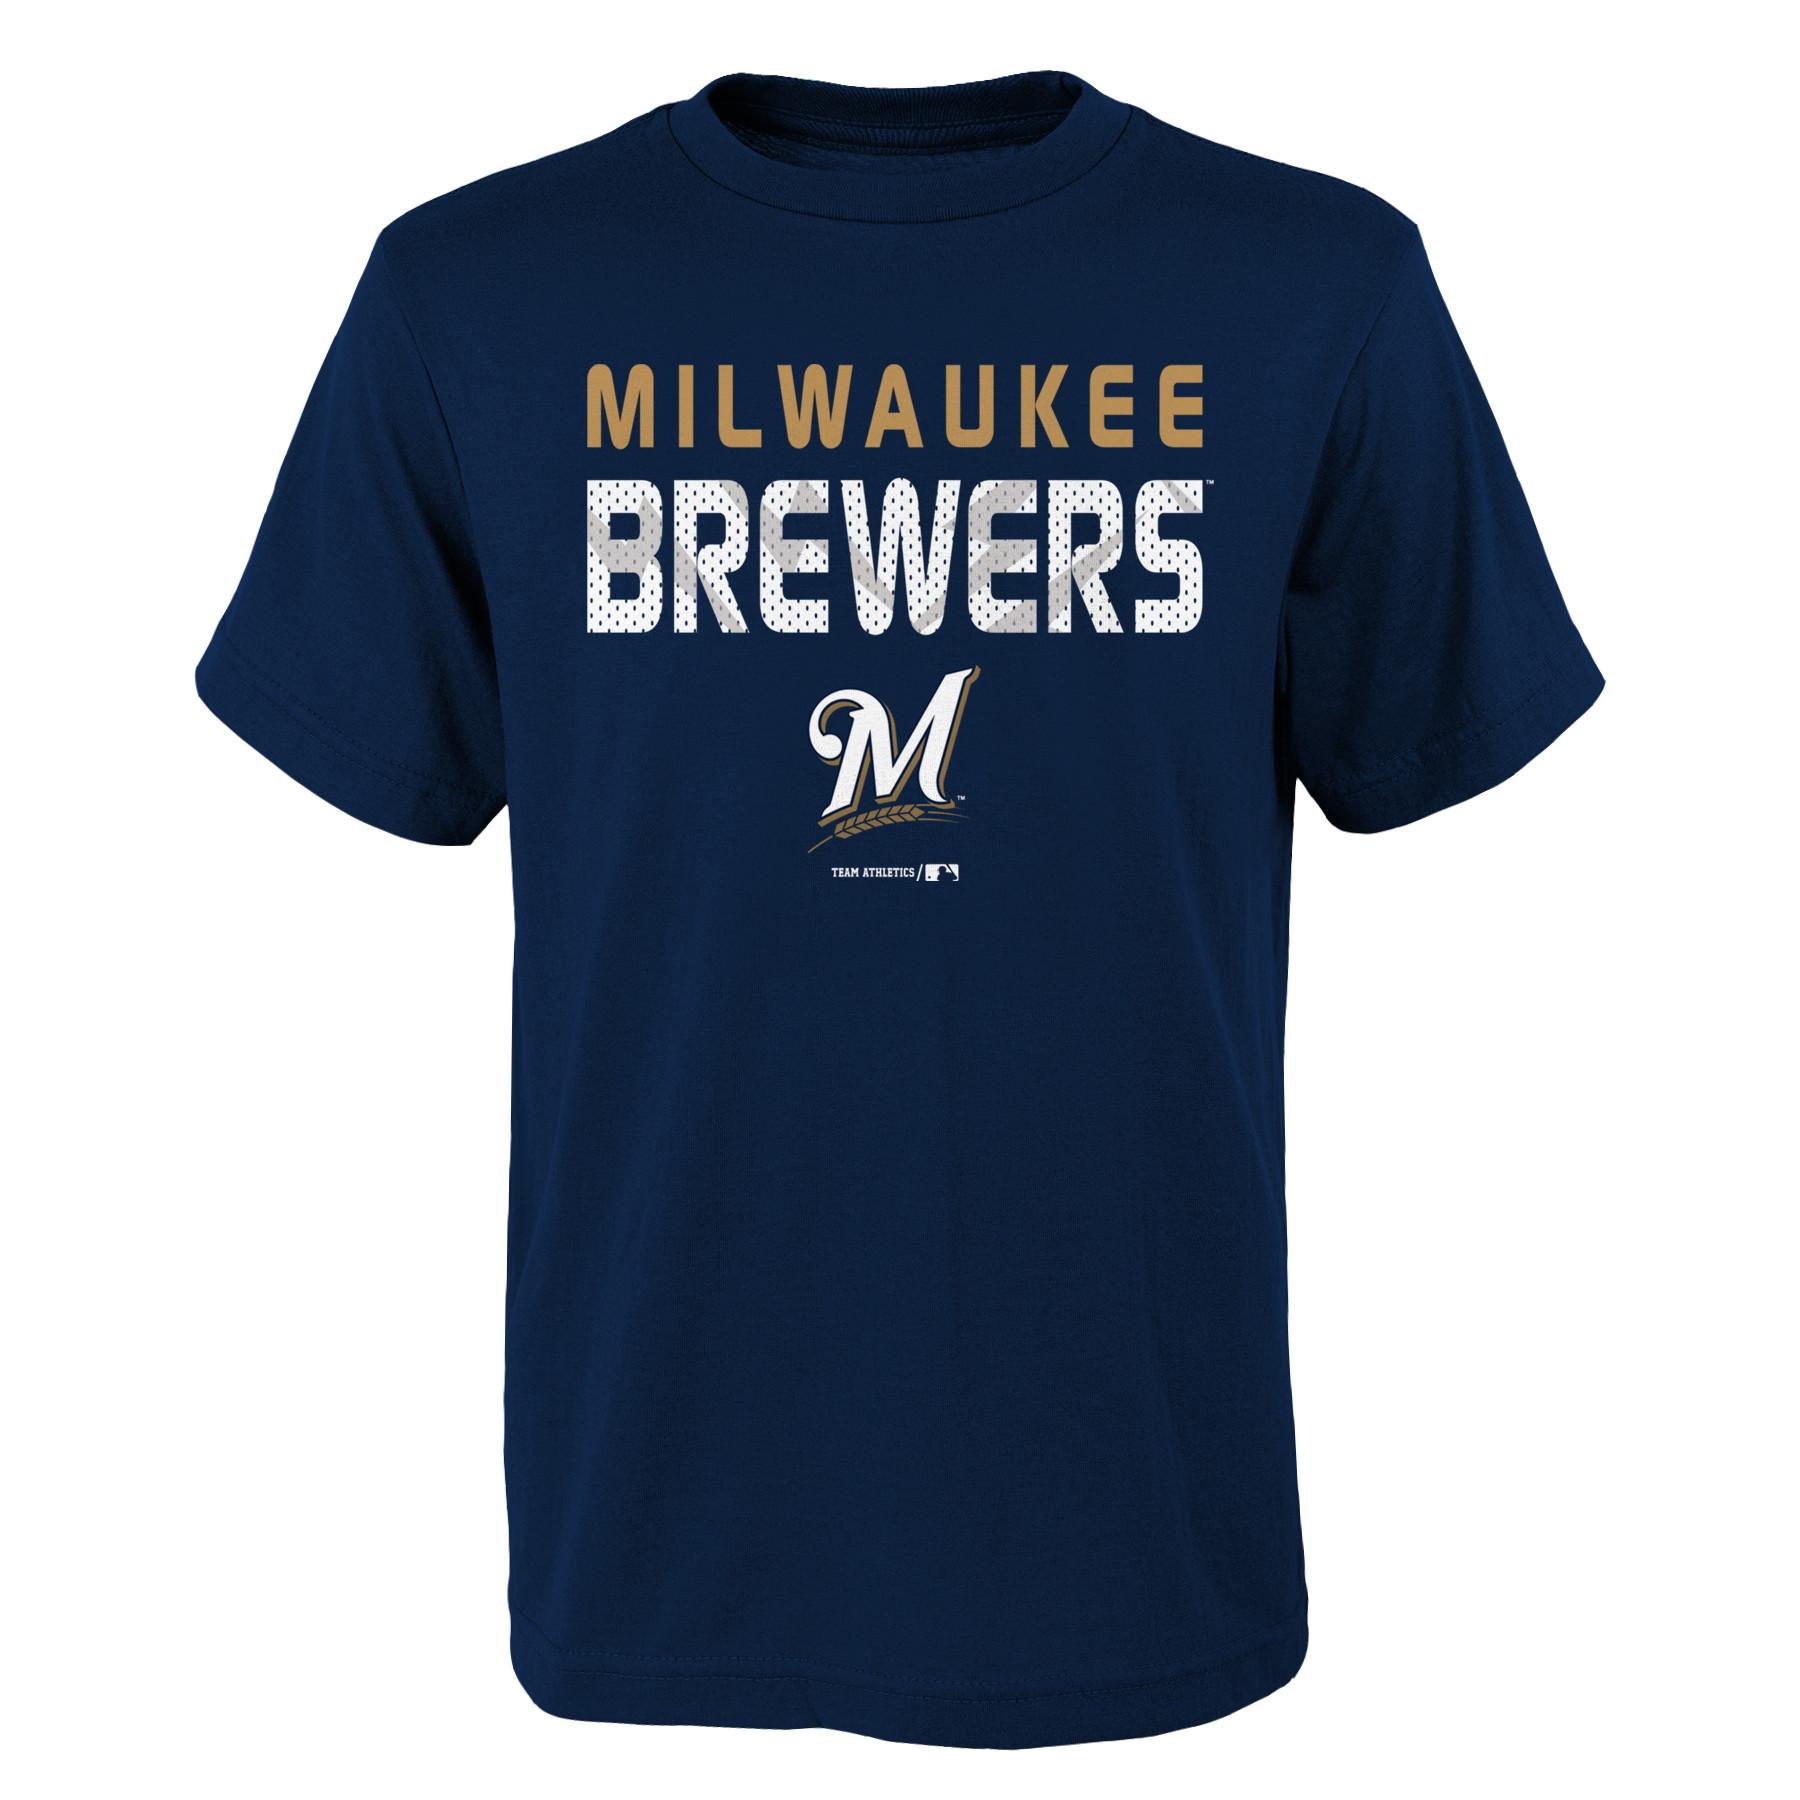 MLB Milwaukee BREWERS TEE Short Sleeve Boys Team Name and LOGO 100% Cotton Team Color 4-18